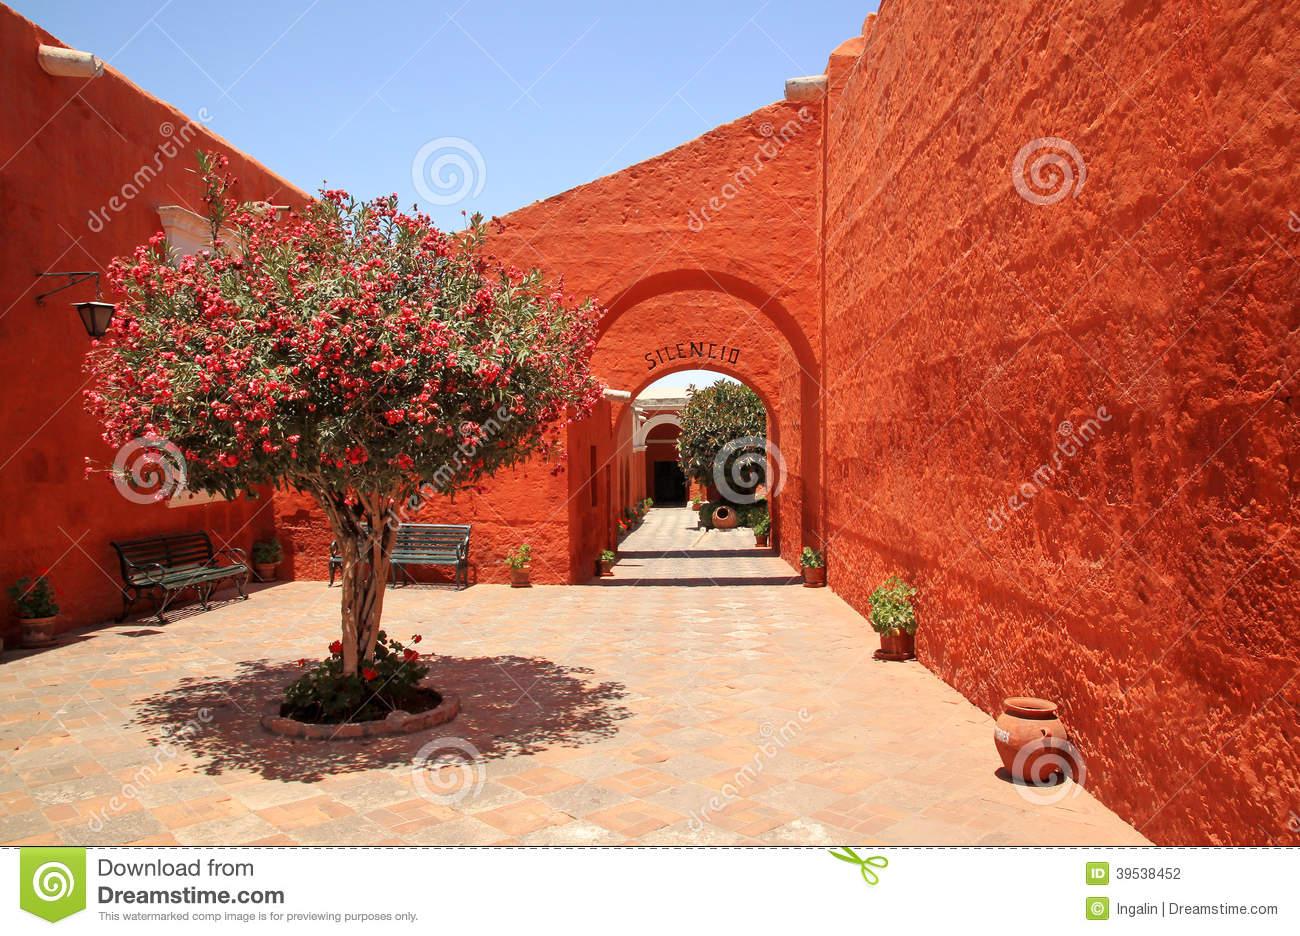 The Monastery Of Saint Catherine (Santa Catalina), Arequipa, Peru.